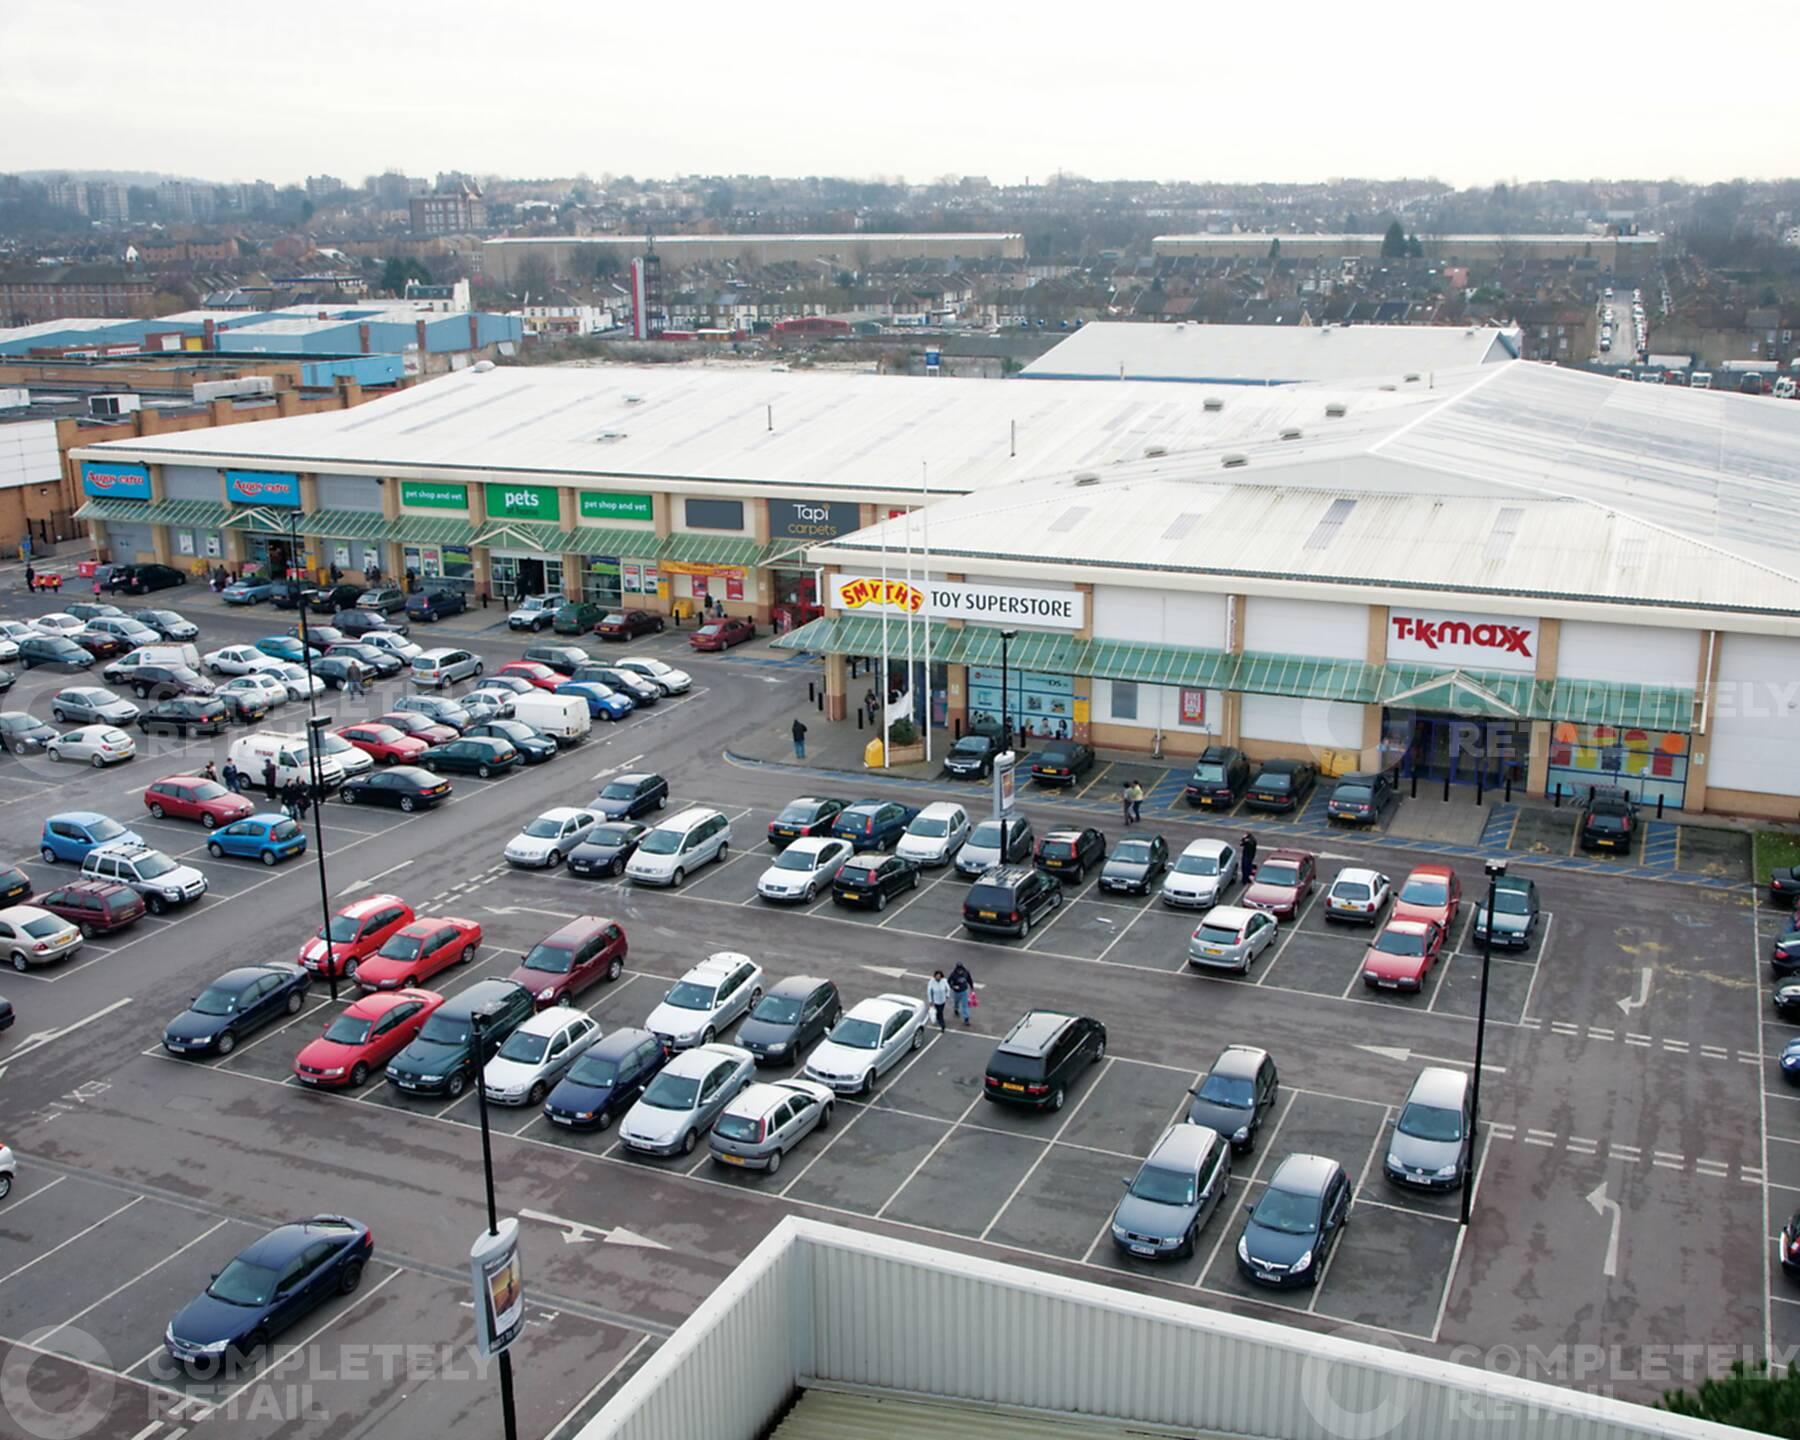 Peninsular Retail Park